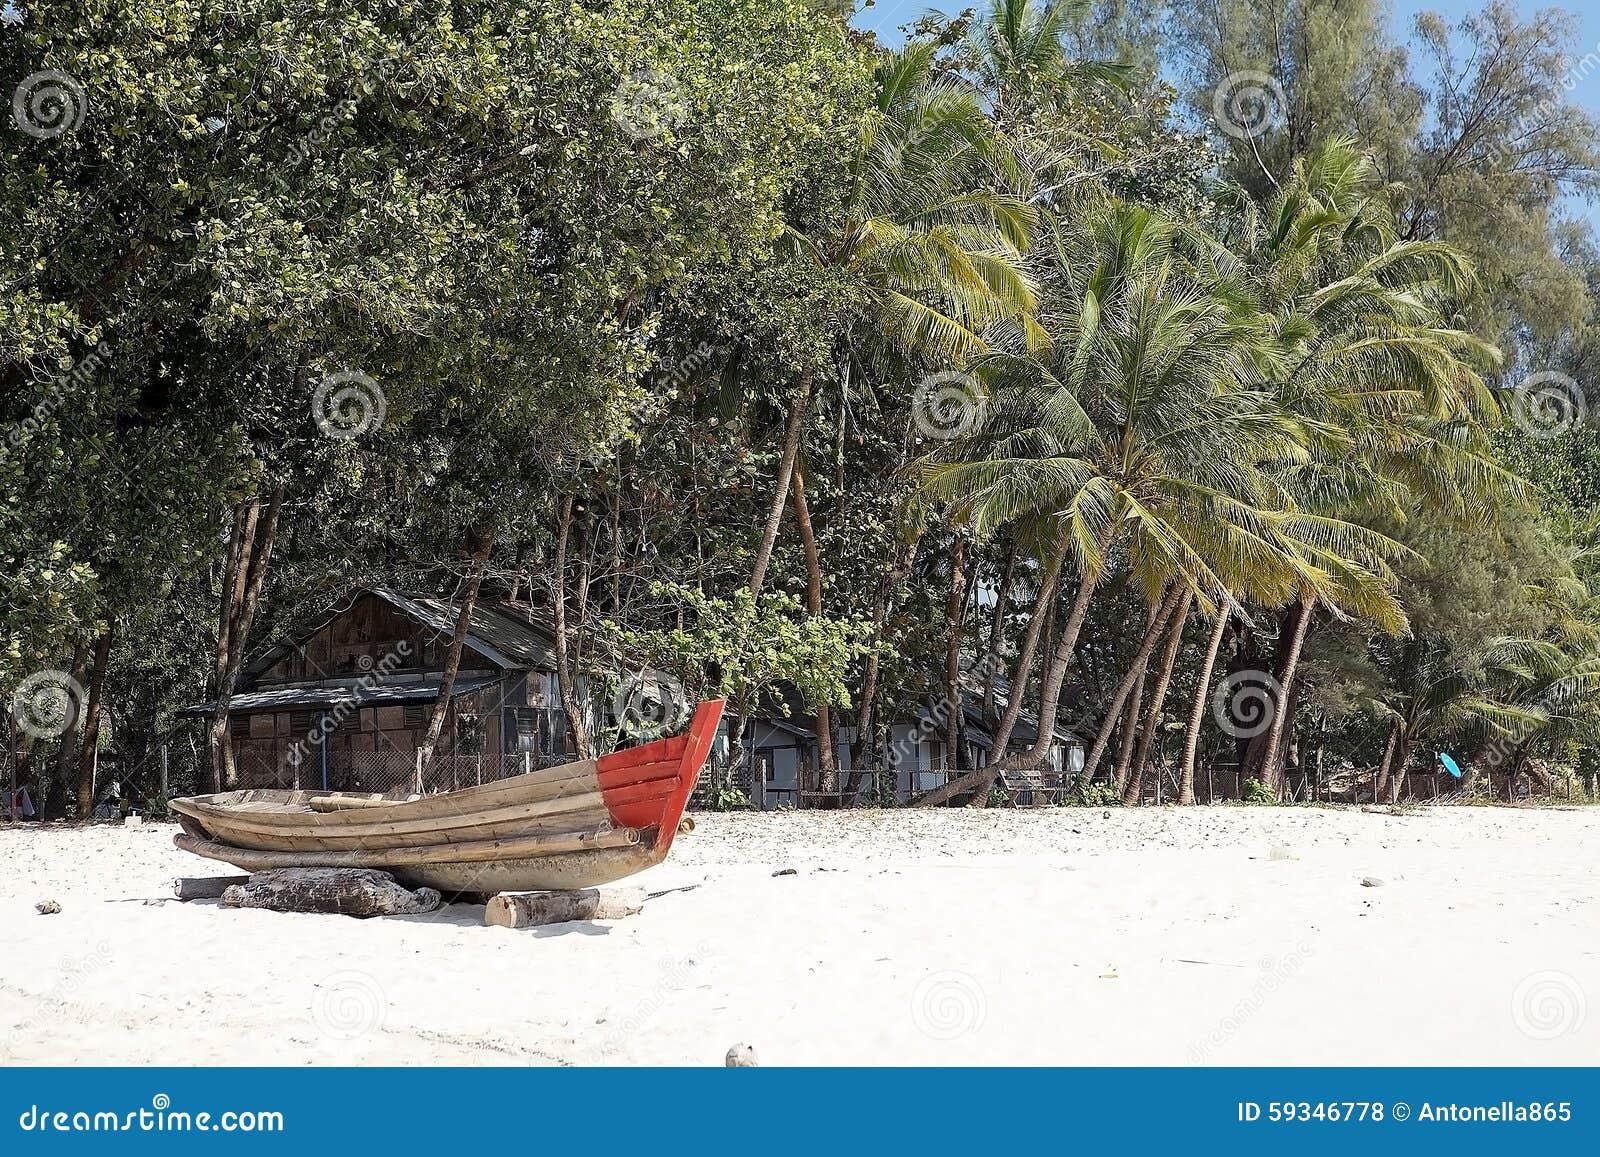 'Tarnished image': Myanmar touts troubled Rakhine as ...